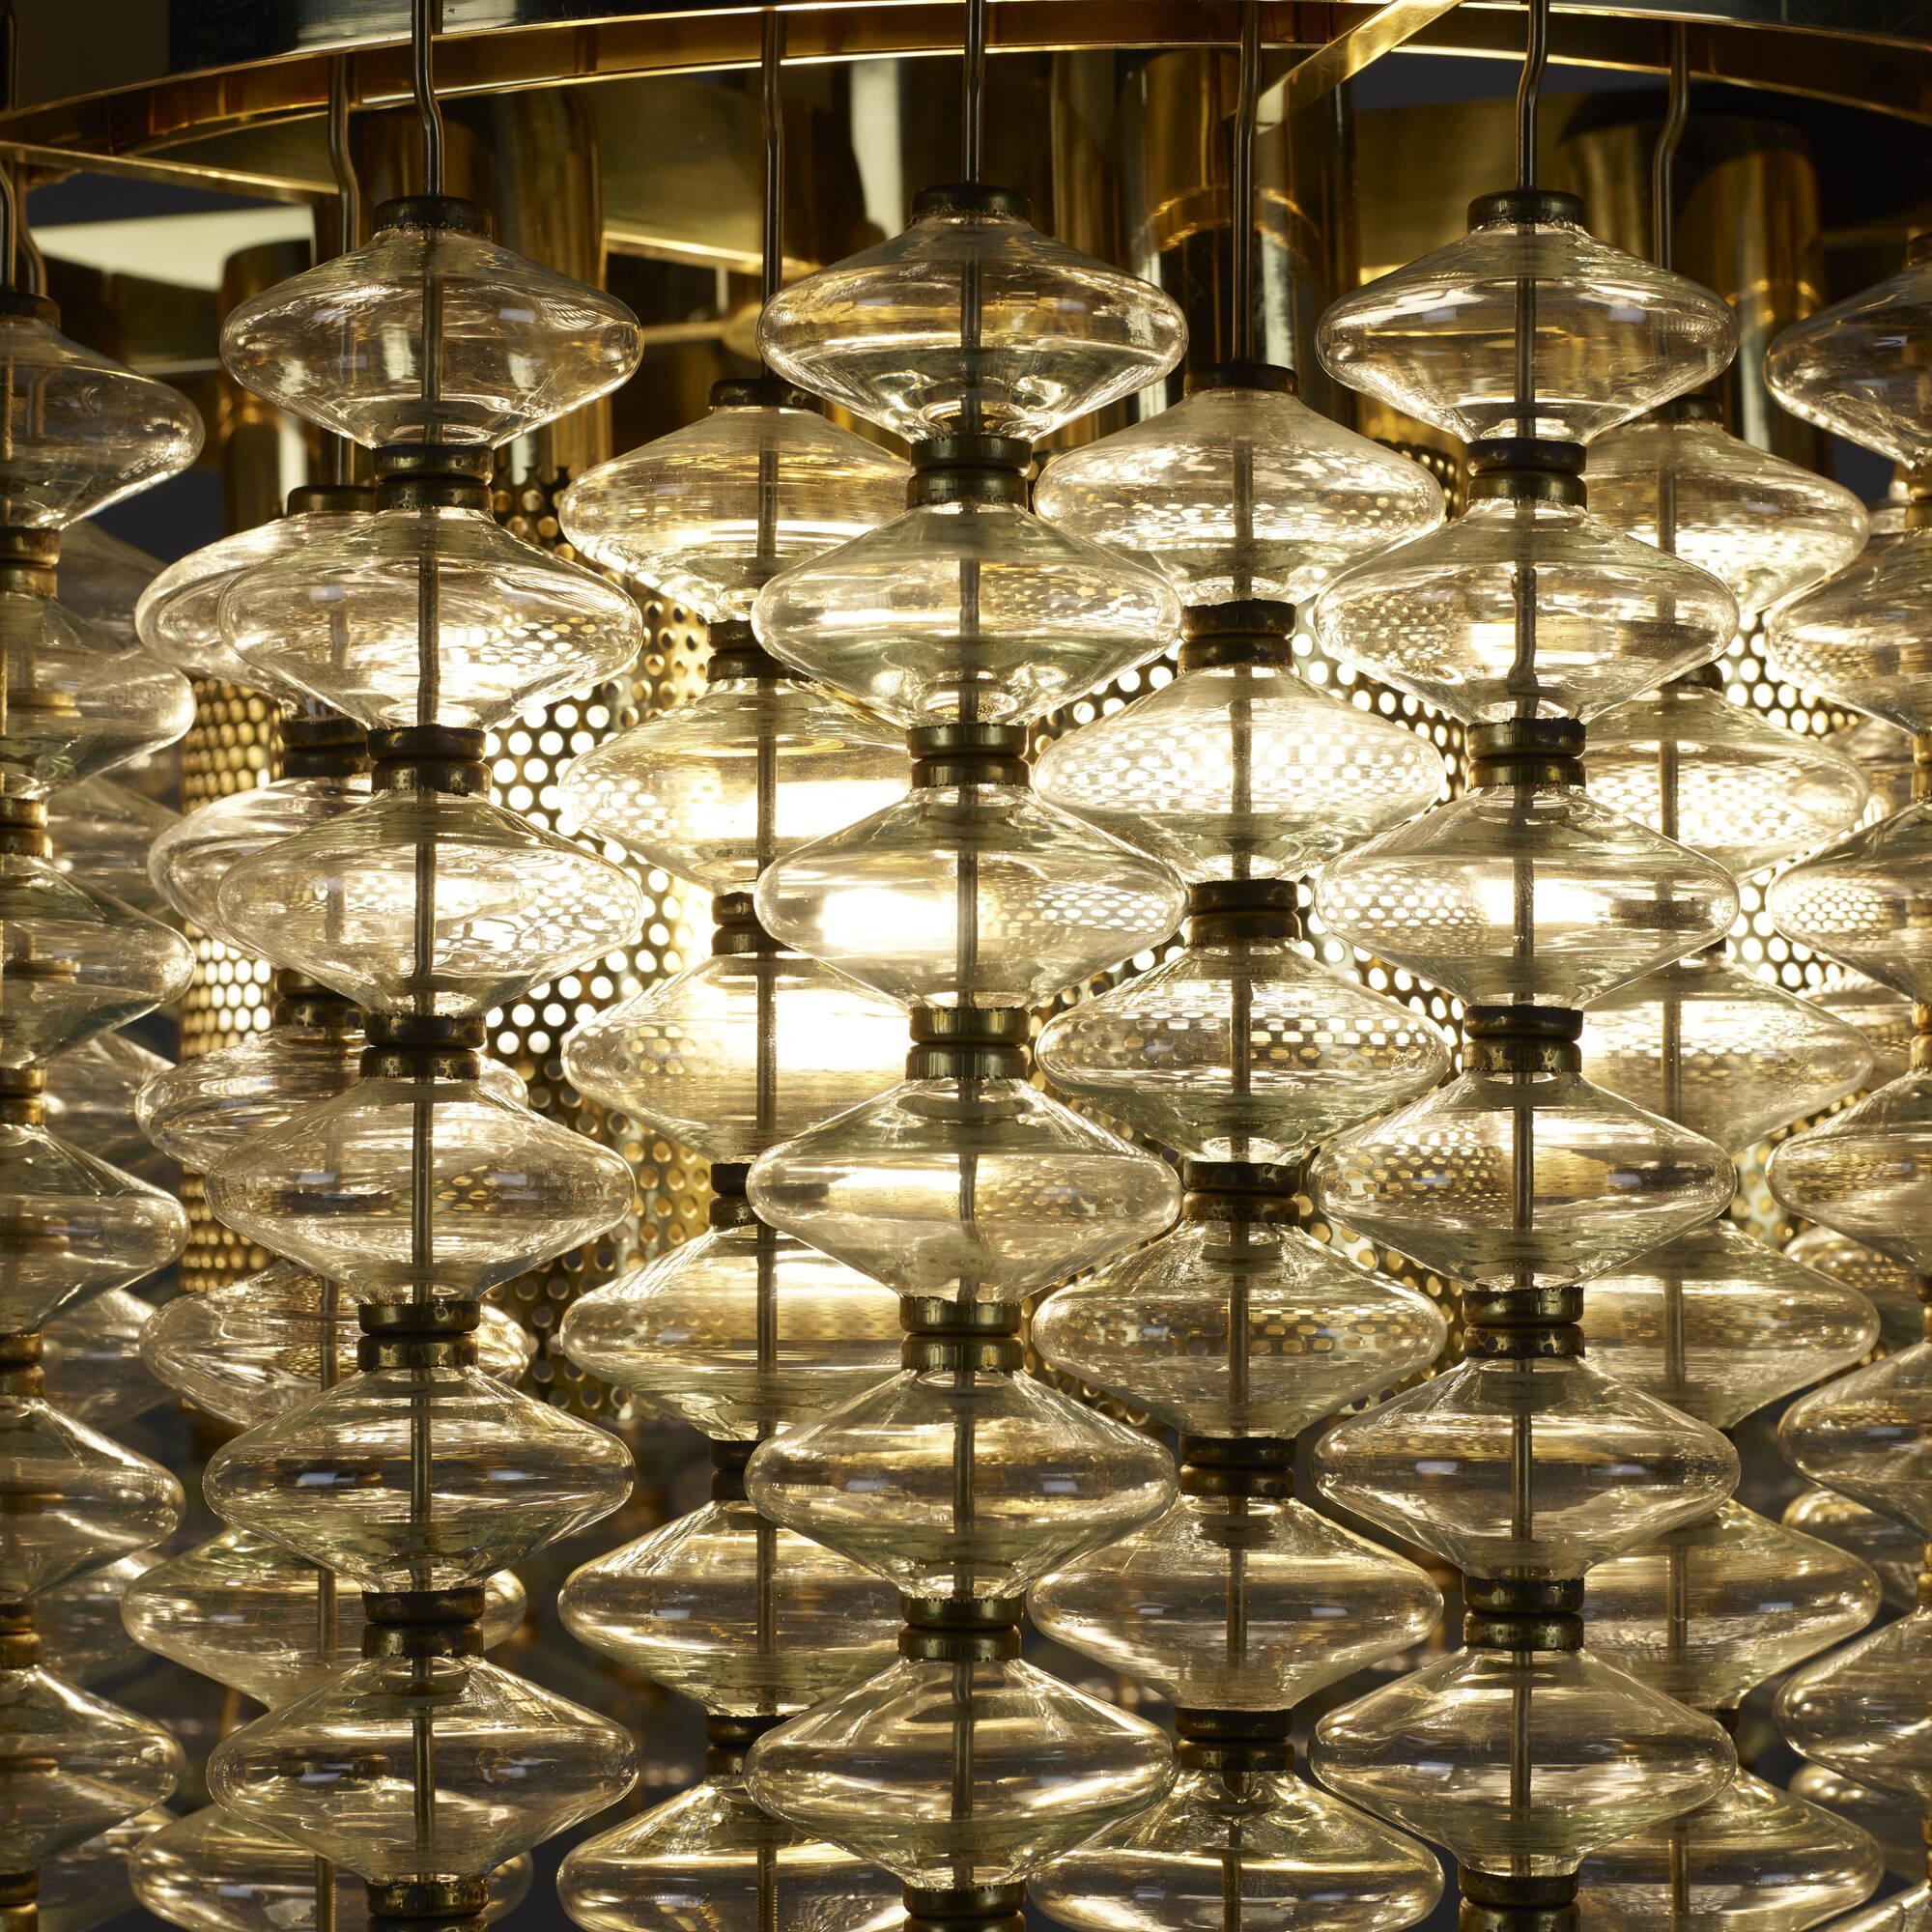 186: Hans-Agne Jakobsson / chandelier (3 of 3)